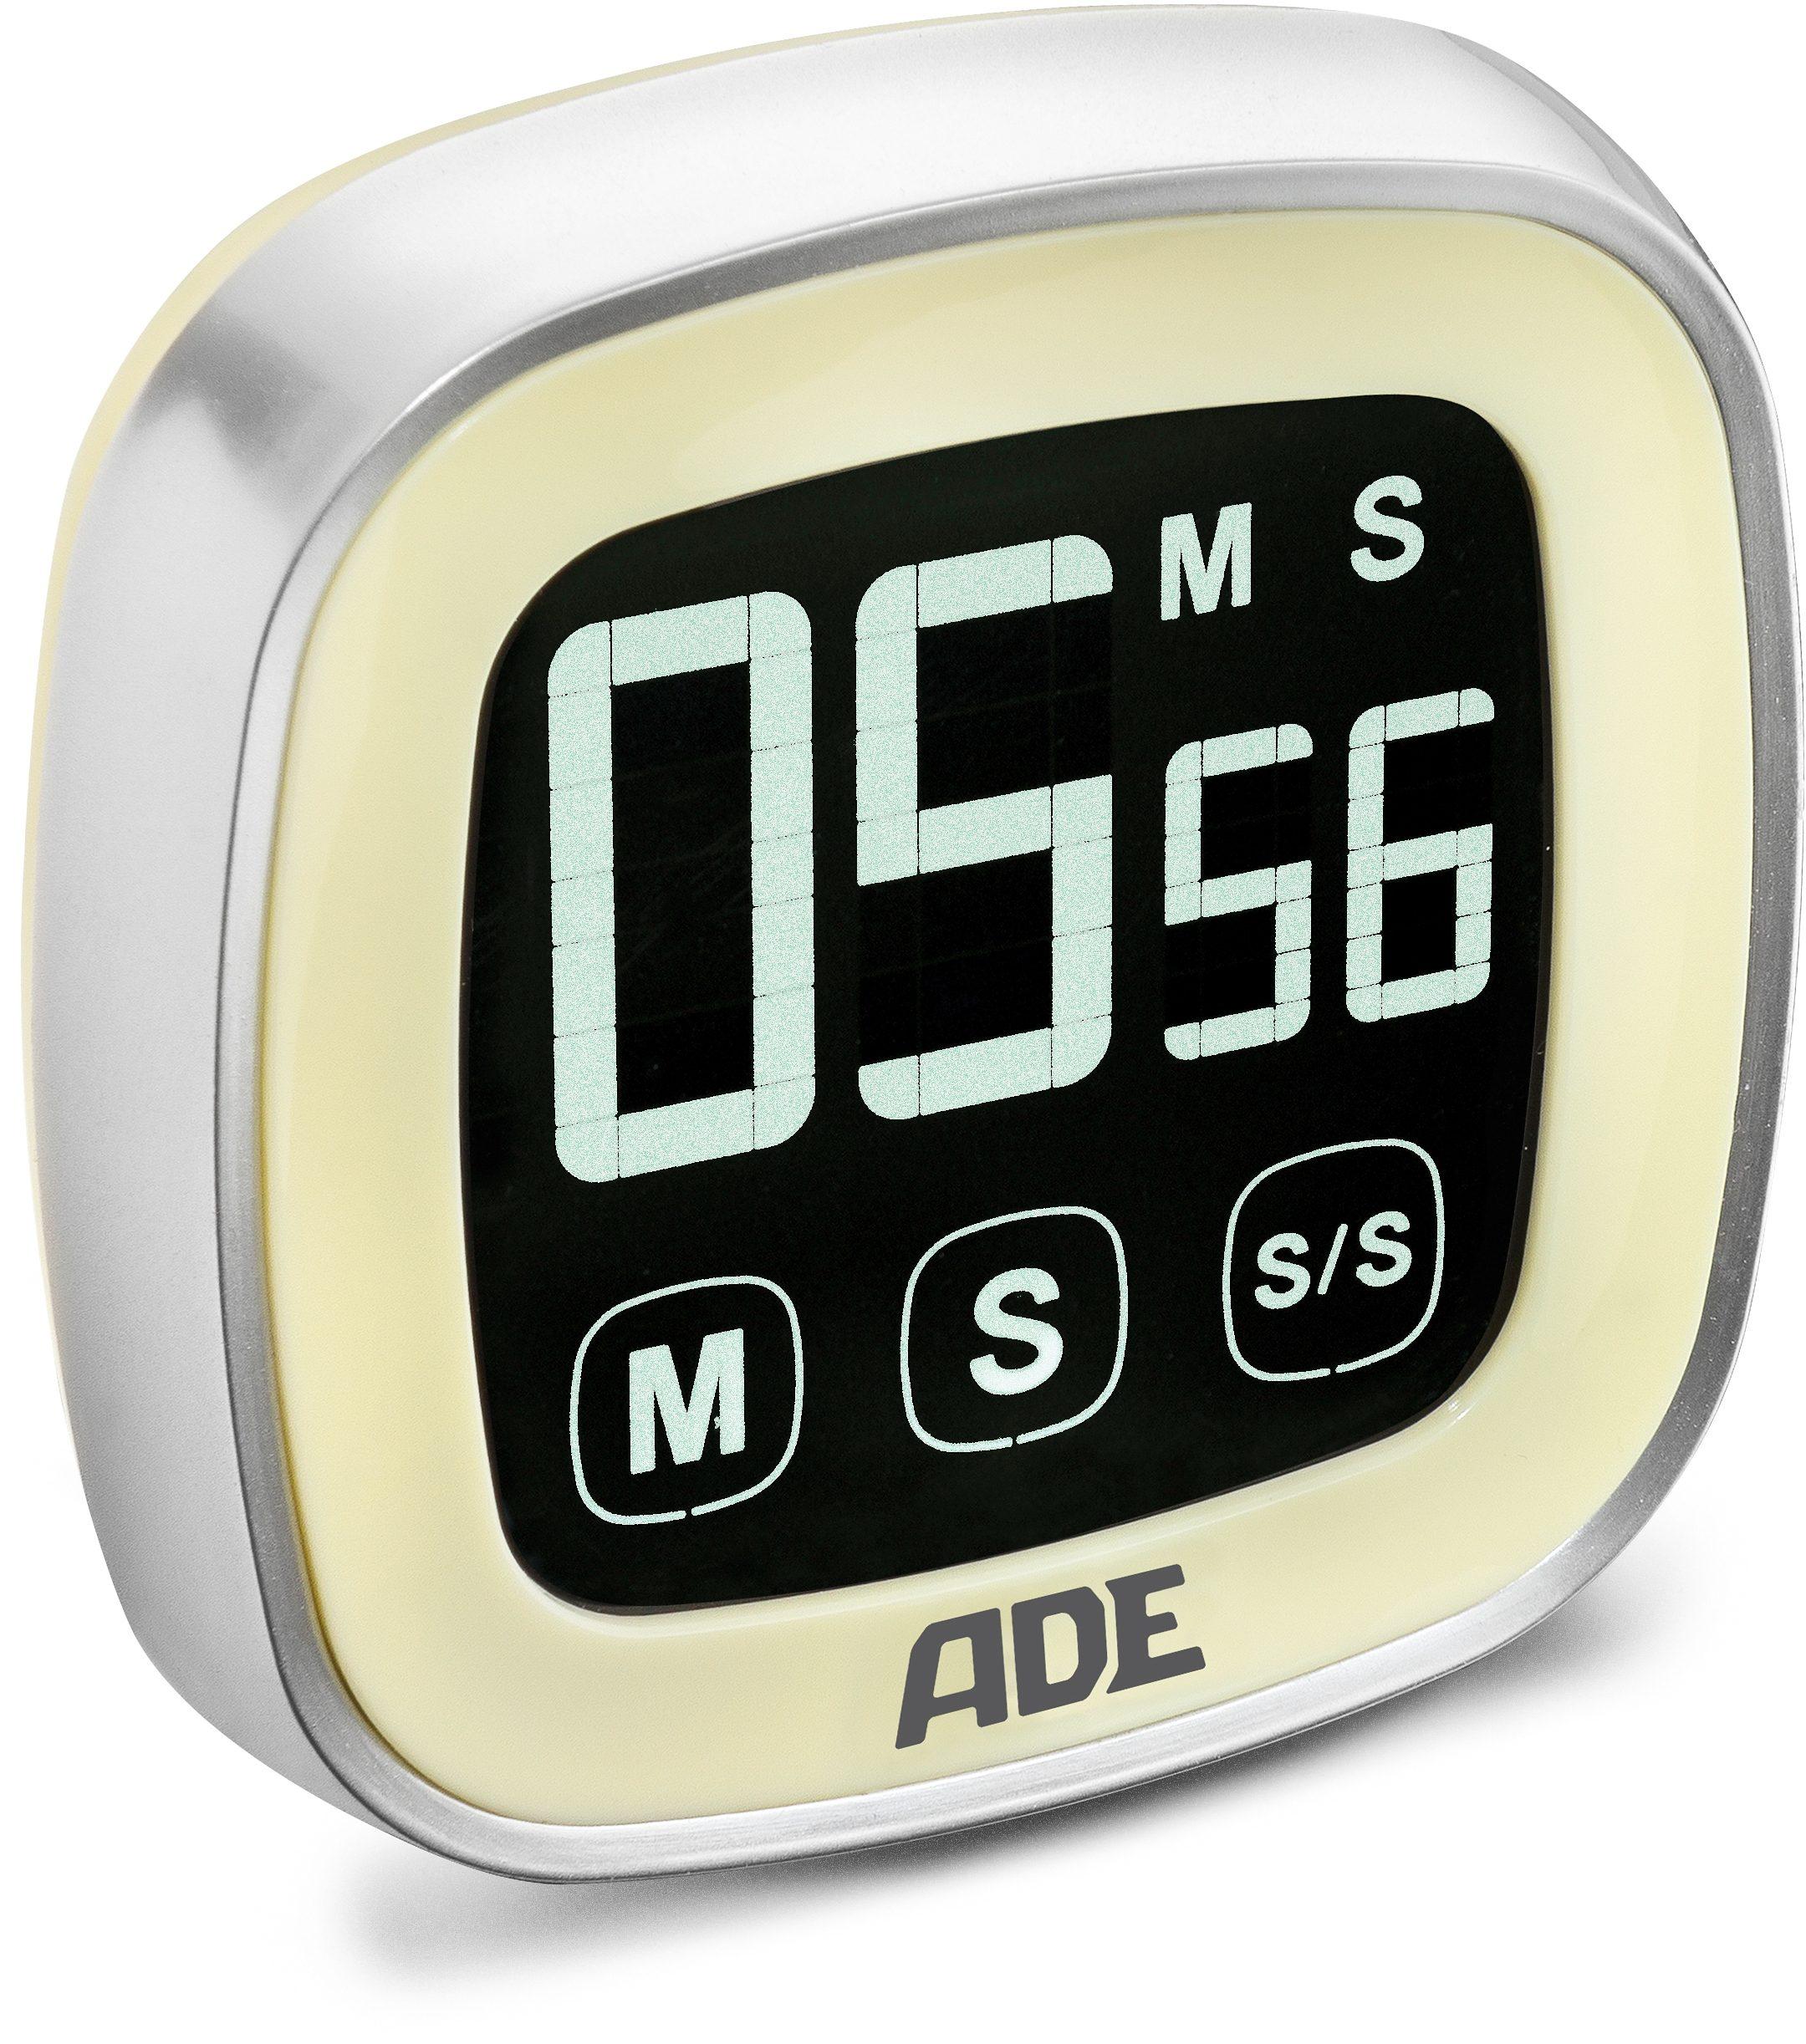 ADE Digitaler Küchentimer TD 1300/1301/1302